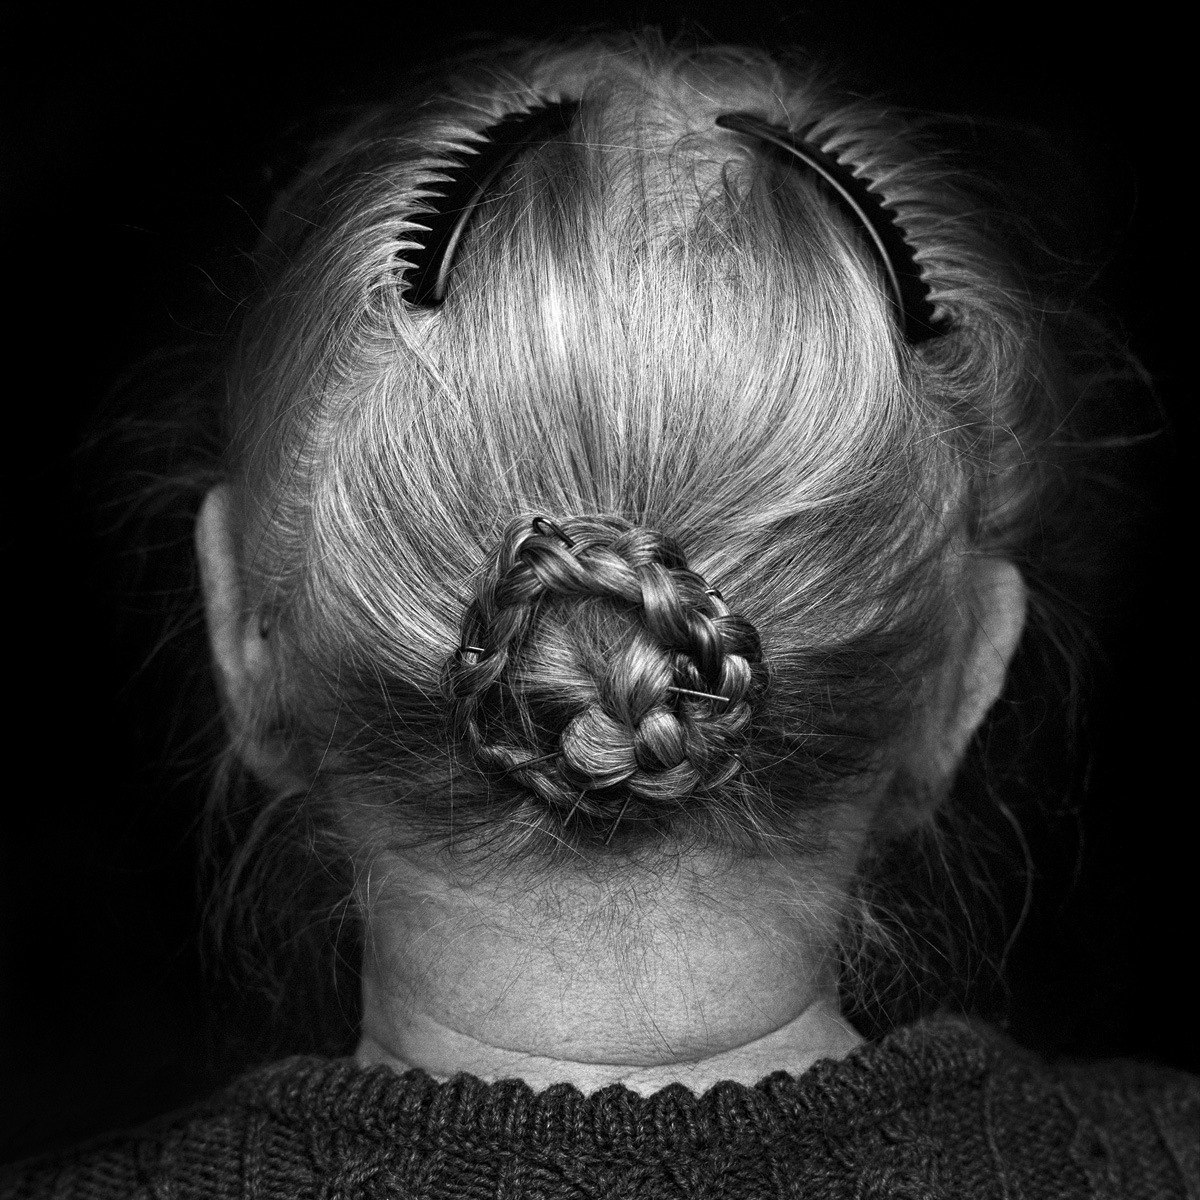 © Christine Turnauer - Maria (Neck), Farmer, Austria, 1996